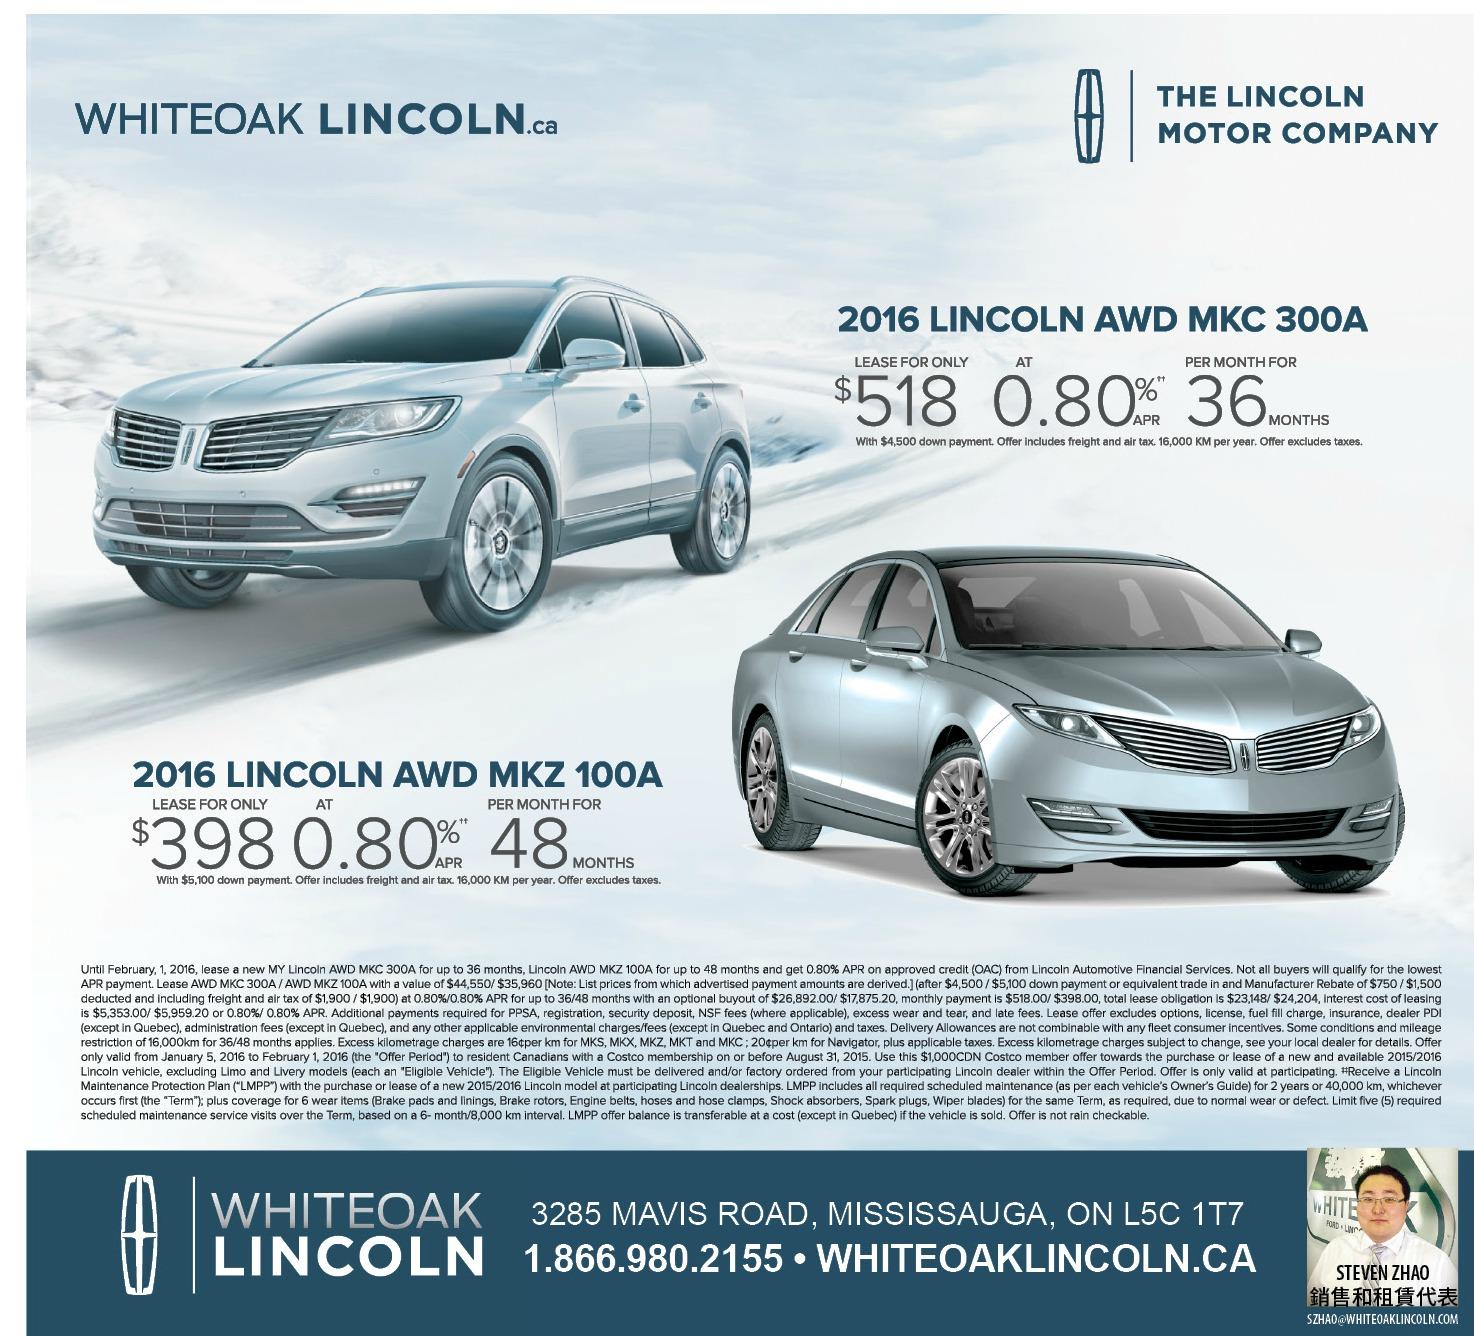 2016 Lincoln Cars: 大多伦多Whiteoak Lincoln车行 2016款林肯MKC 300A月付起价518元